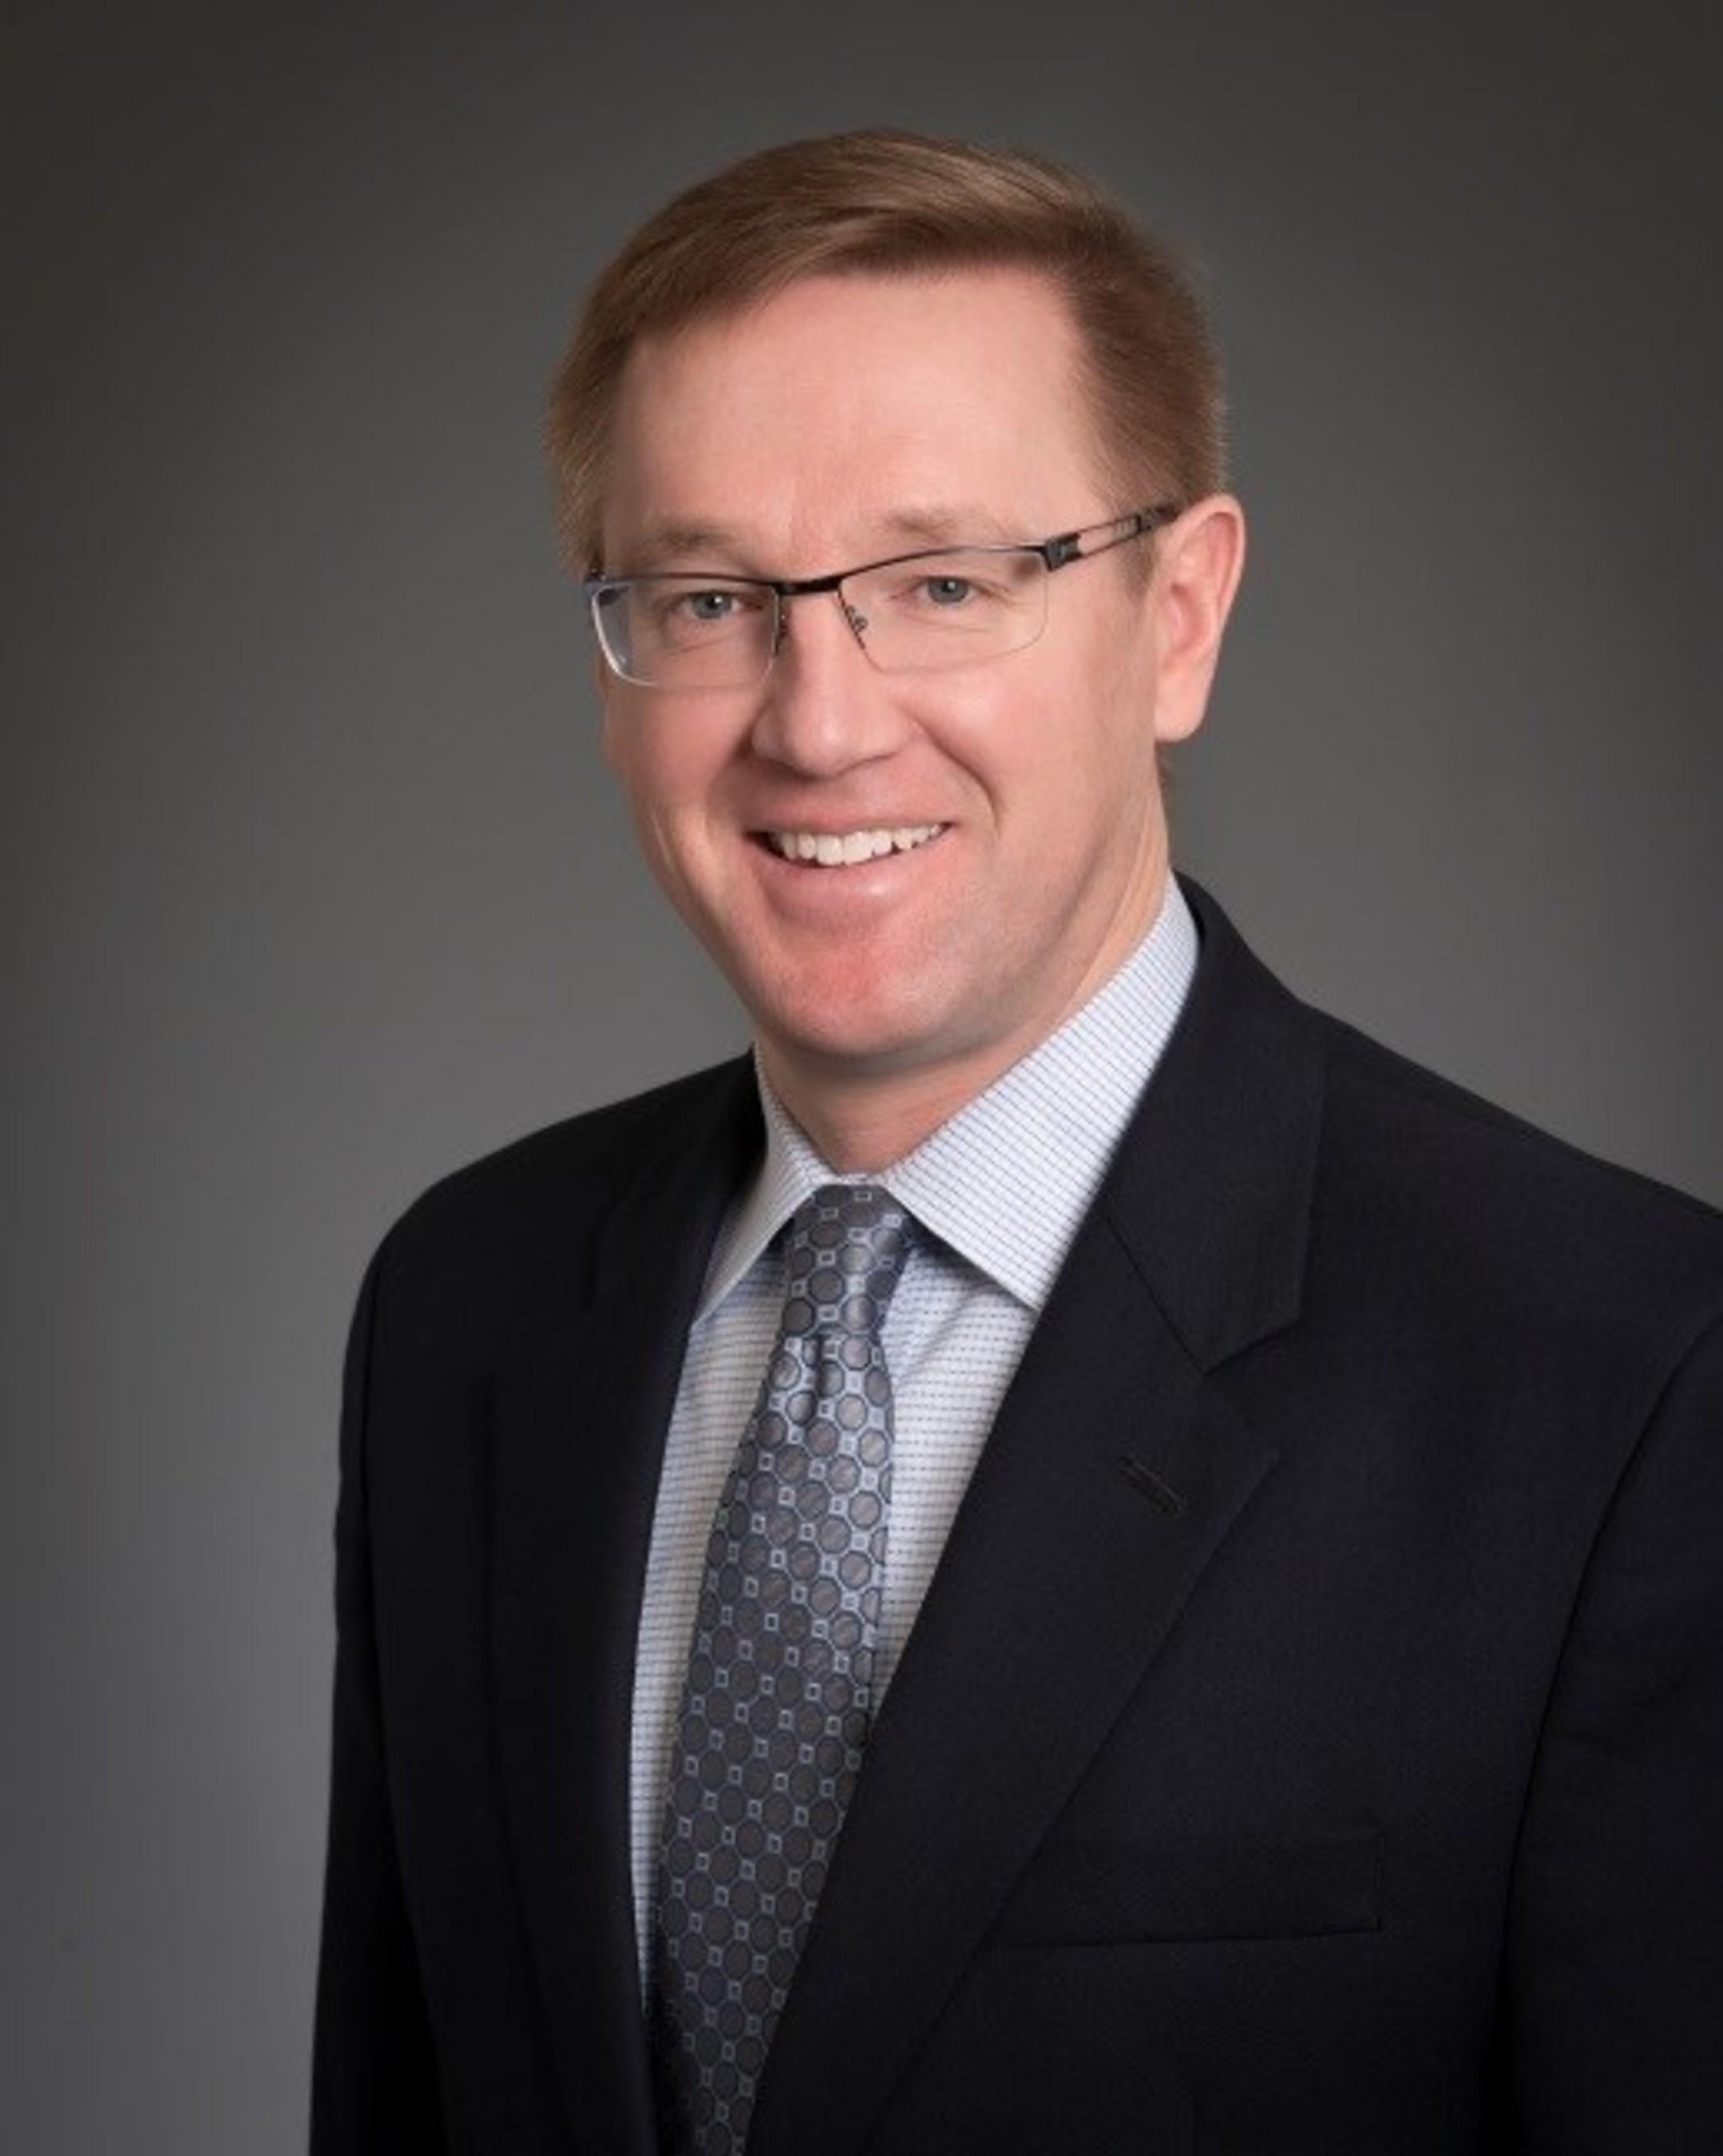 Mike Greene, CFP, 2015 Chair-elect of CFP Board's Board of Directors